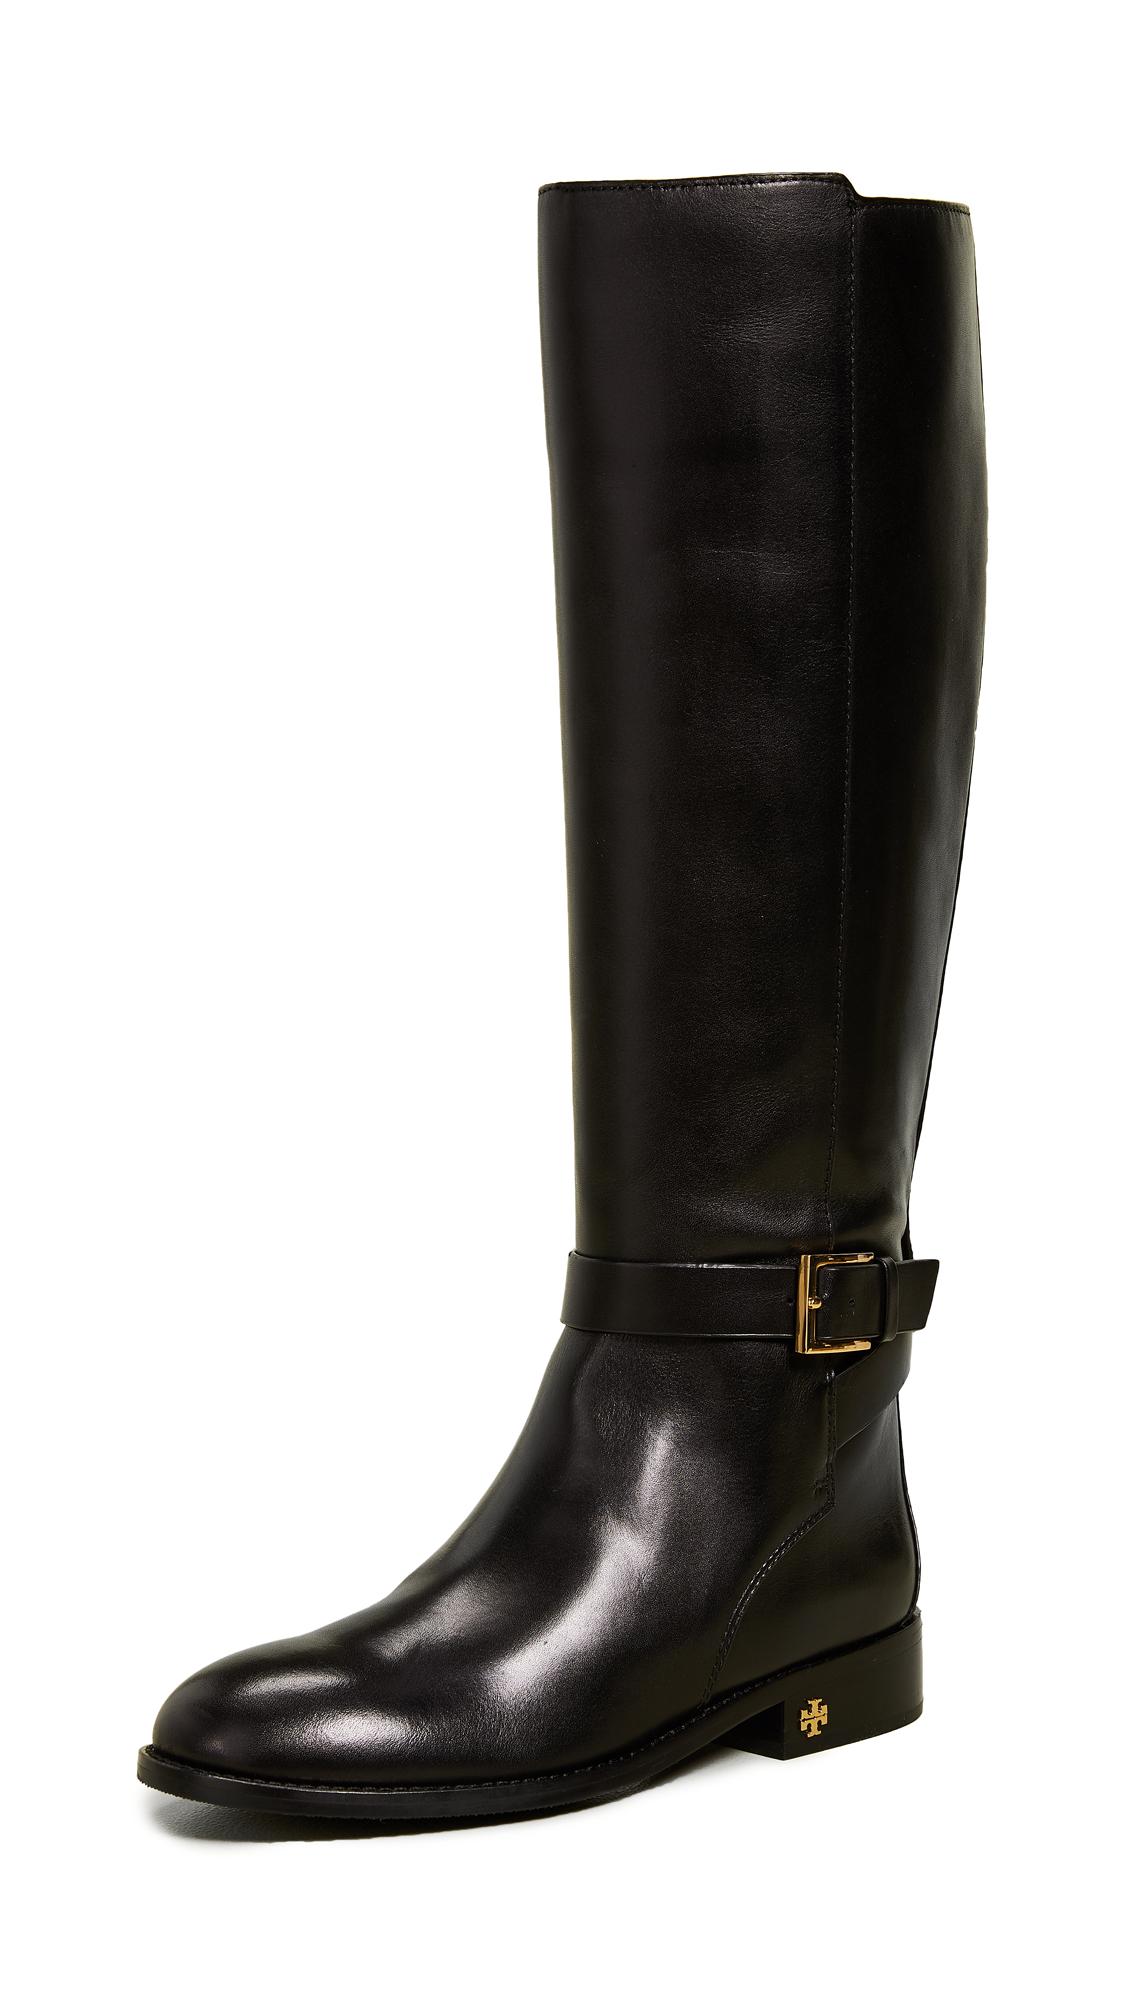 Tory Burch Brooke Tall Boots - Perfect Black